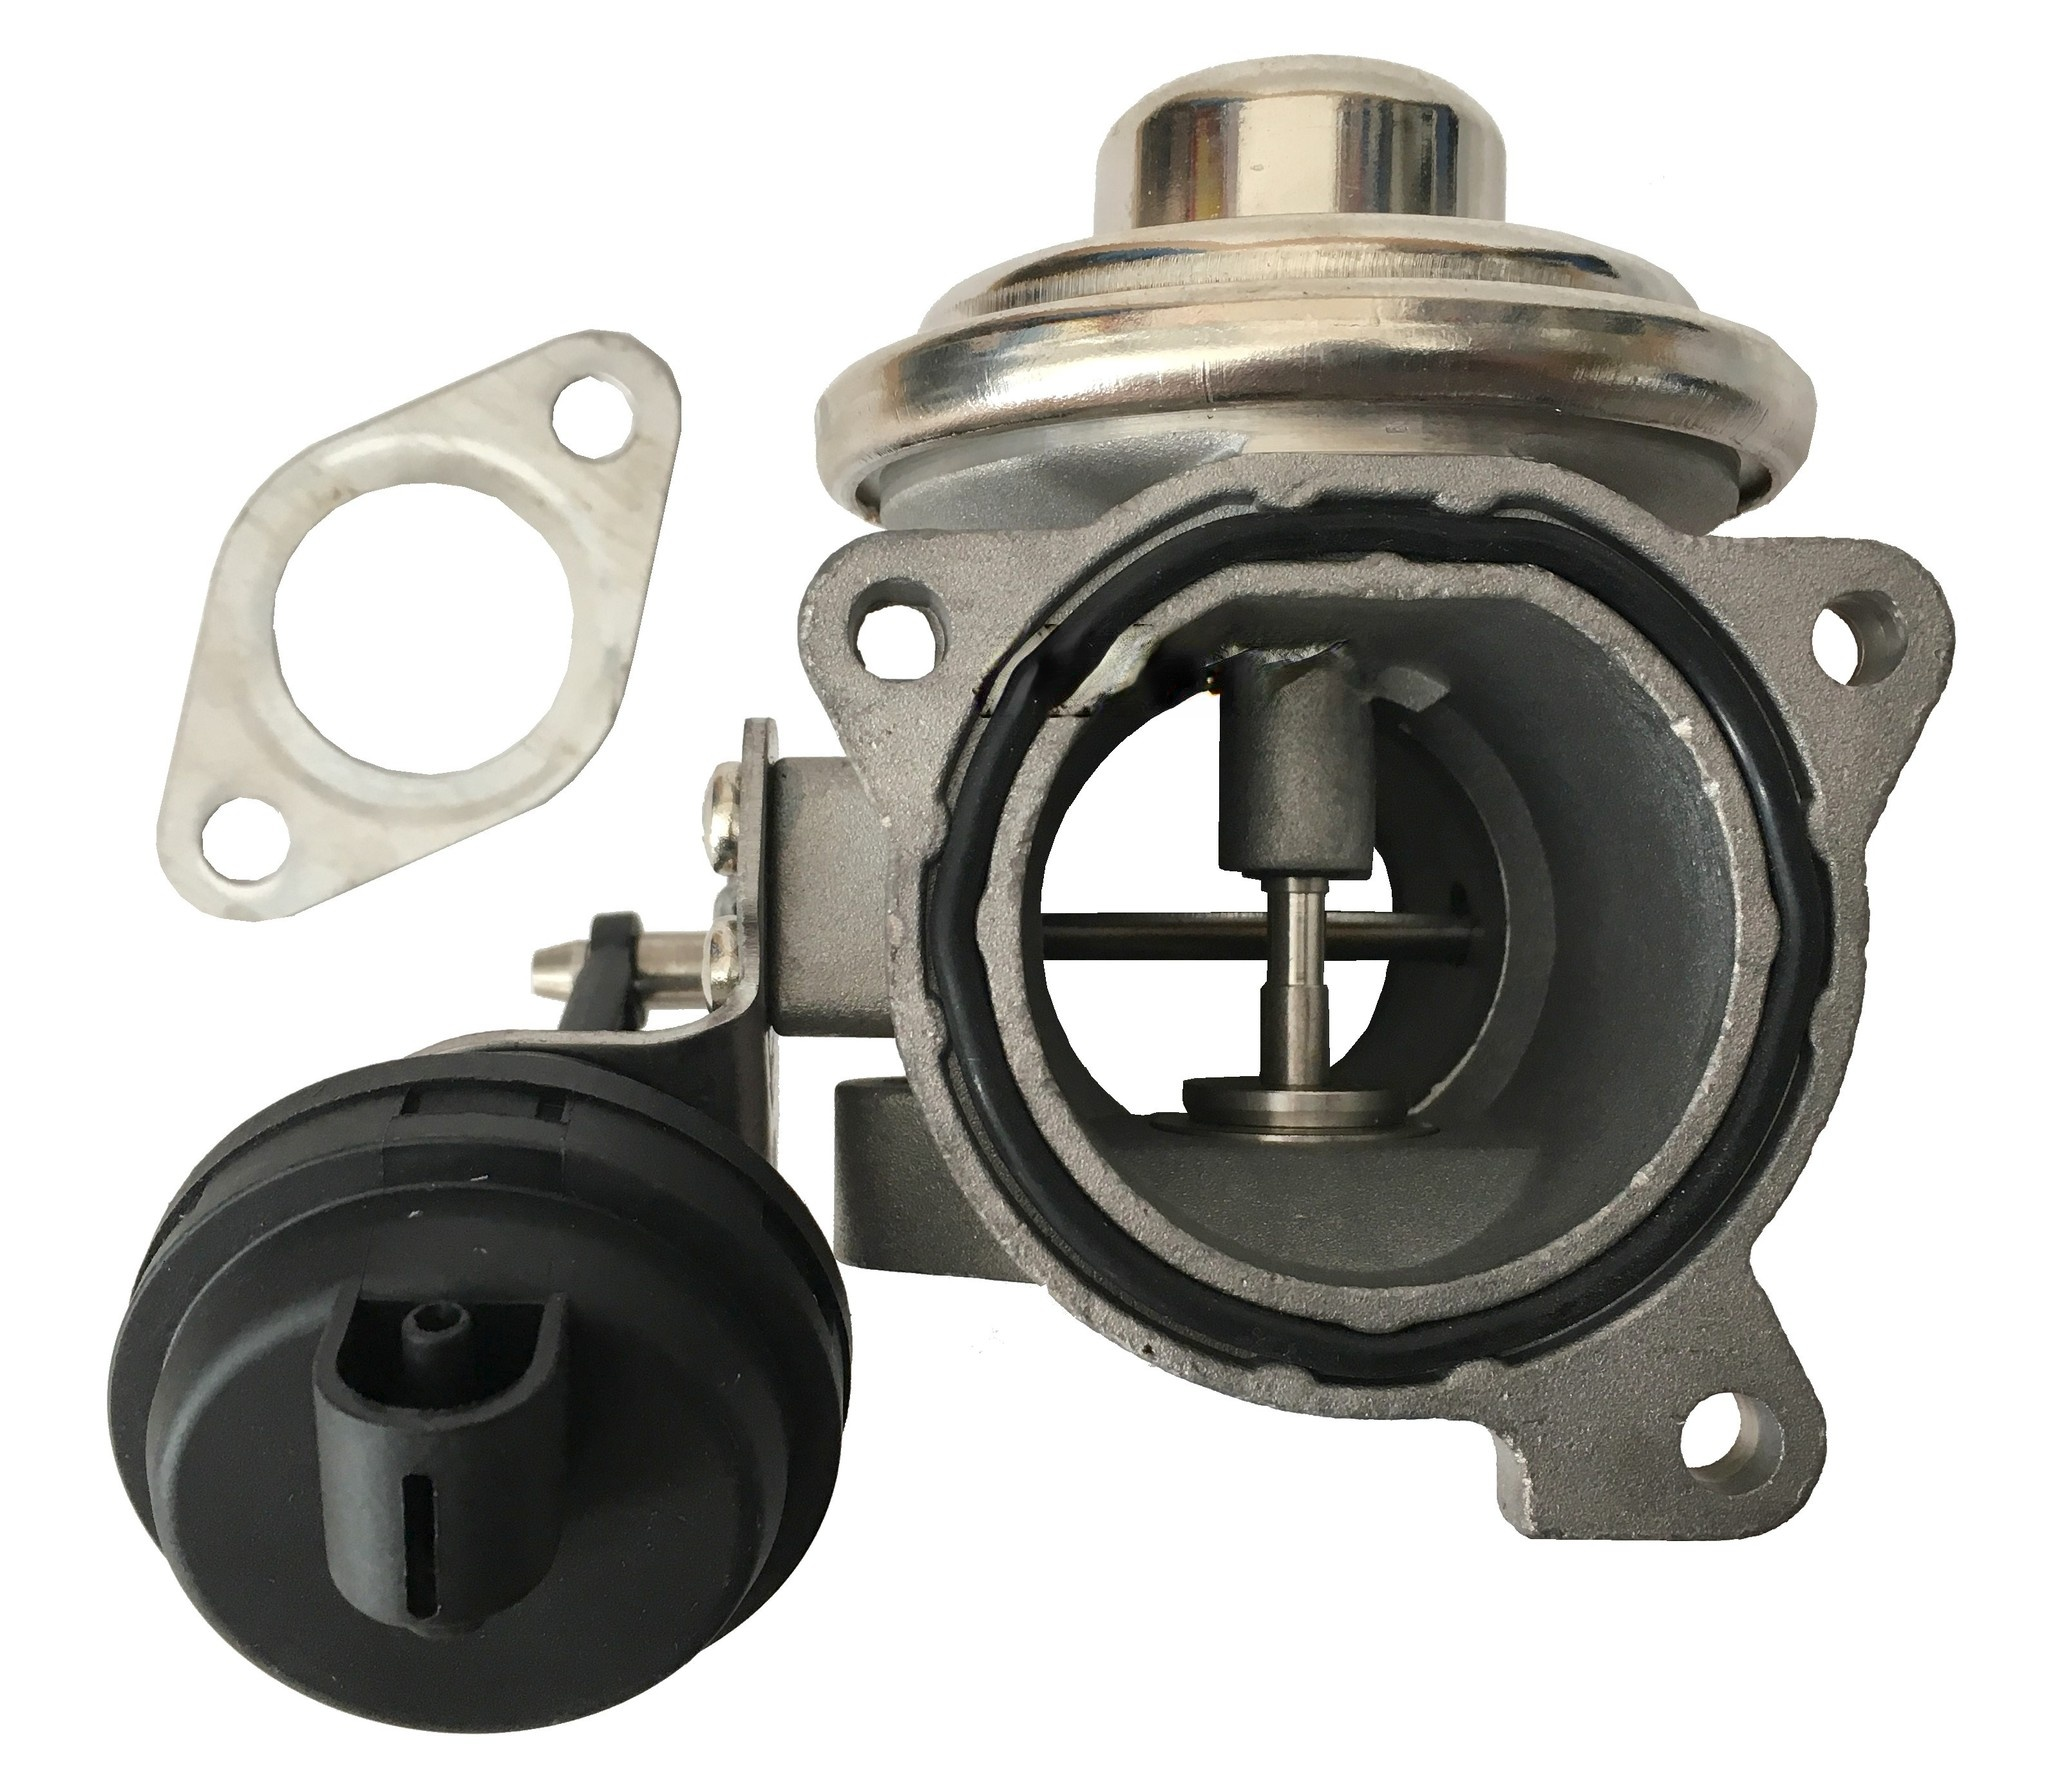 EGR ventil - TR00599 A4 Alhambra Superb Passat 1.9TDi EGR/AGR ventily prémiové kvality